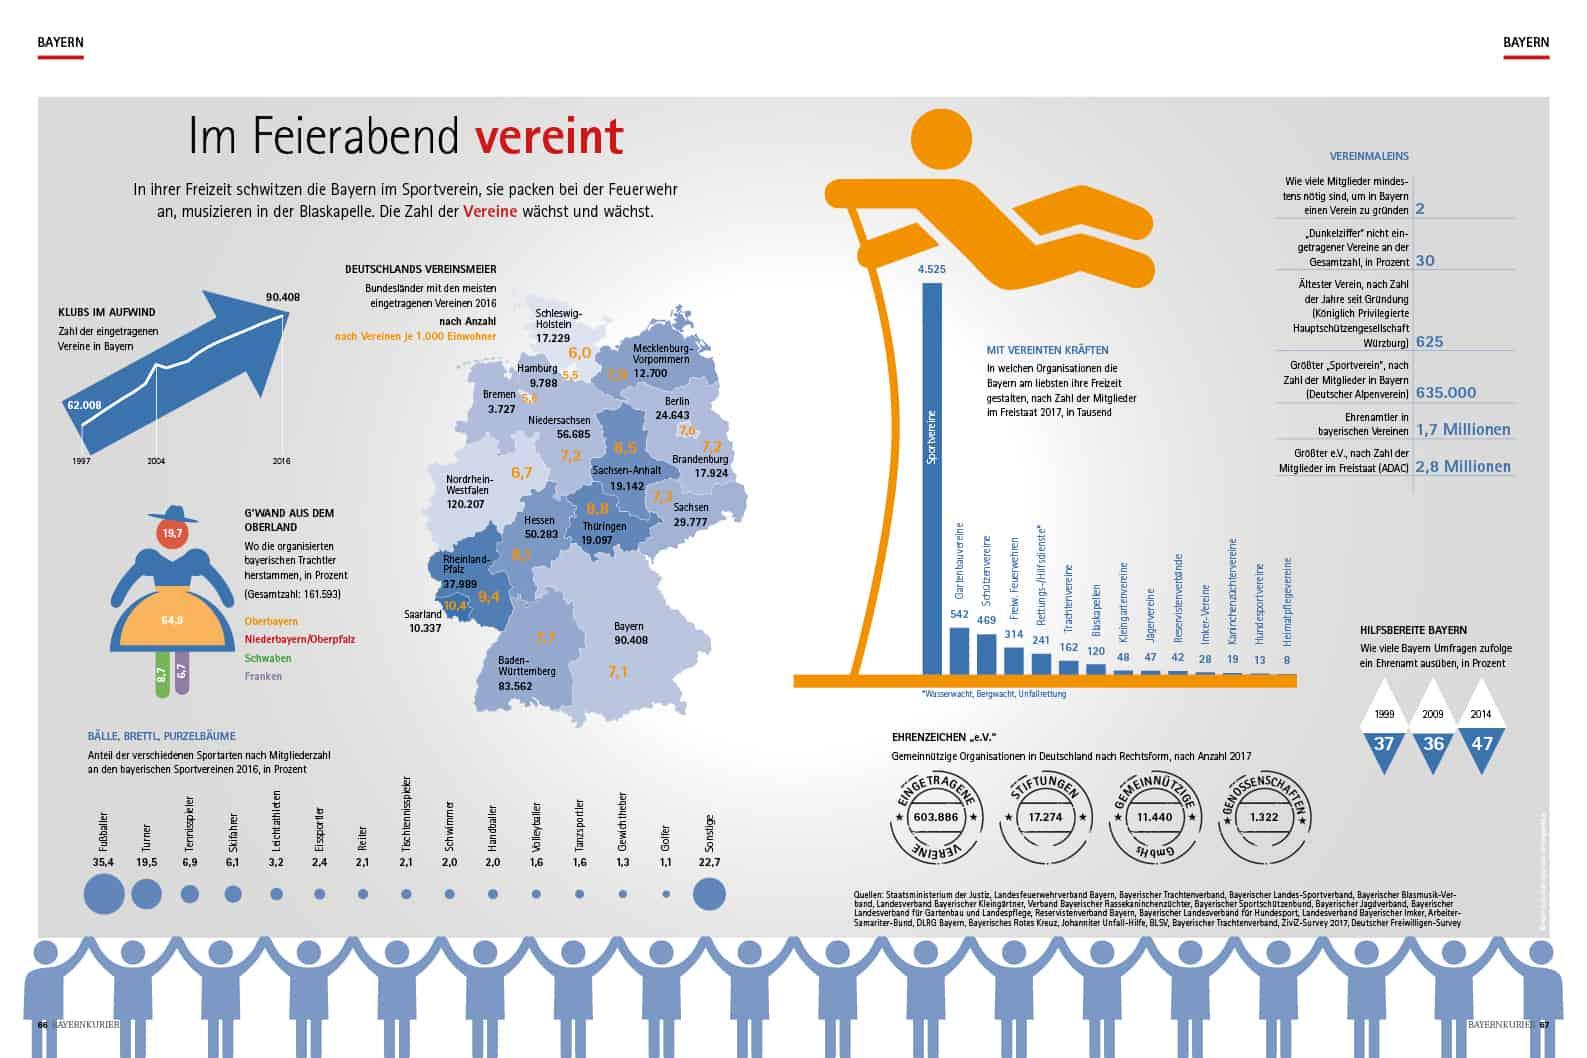 Bayernkurier – Infographic